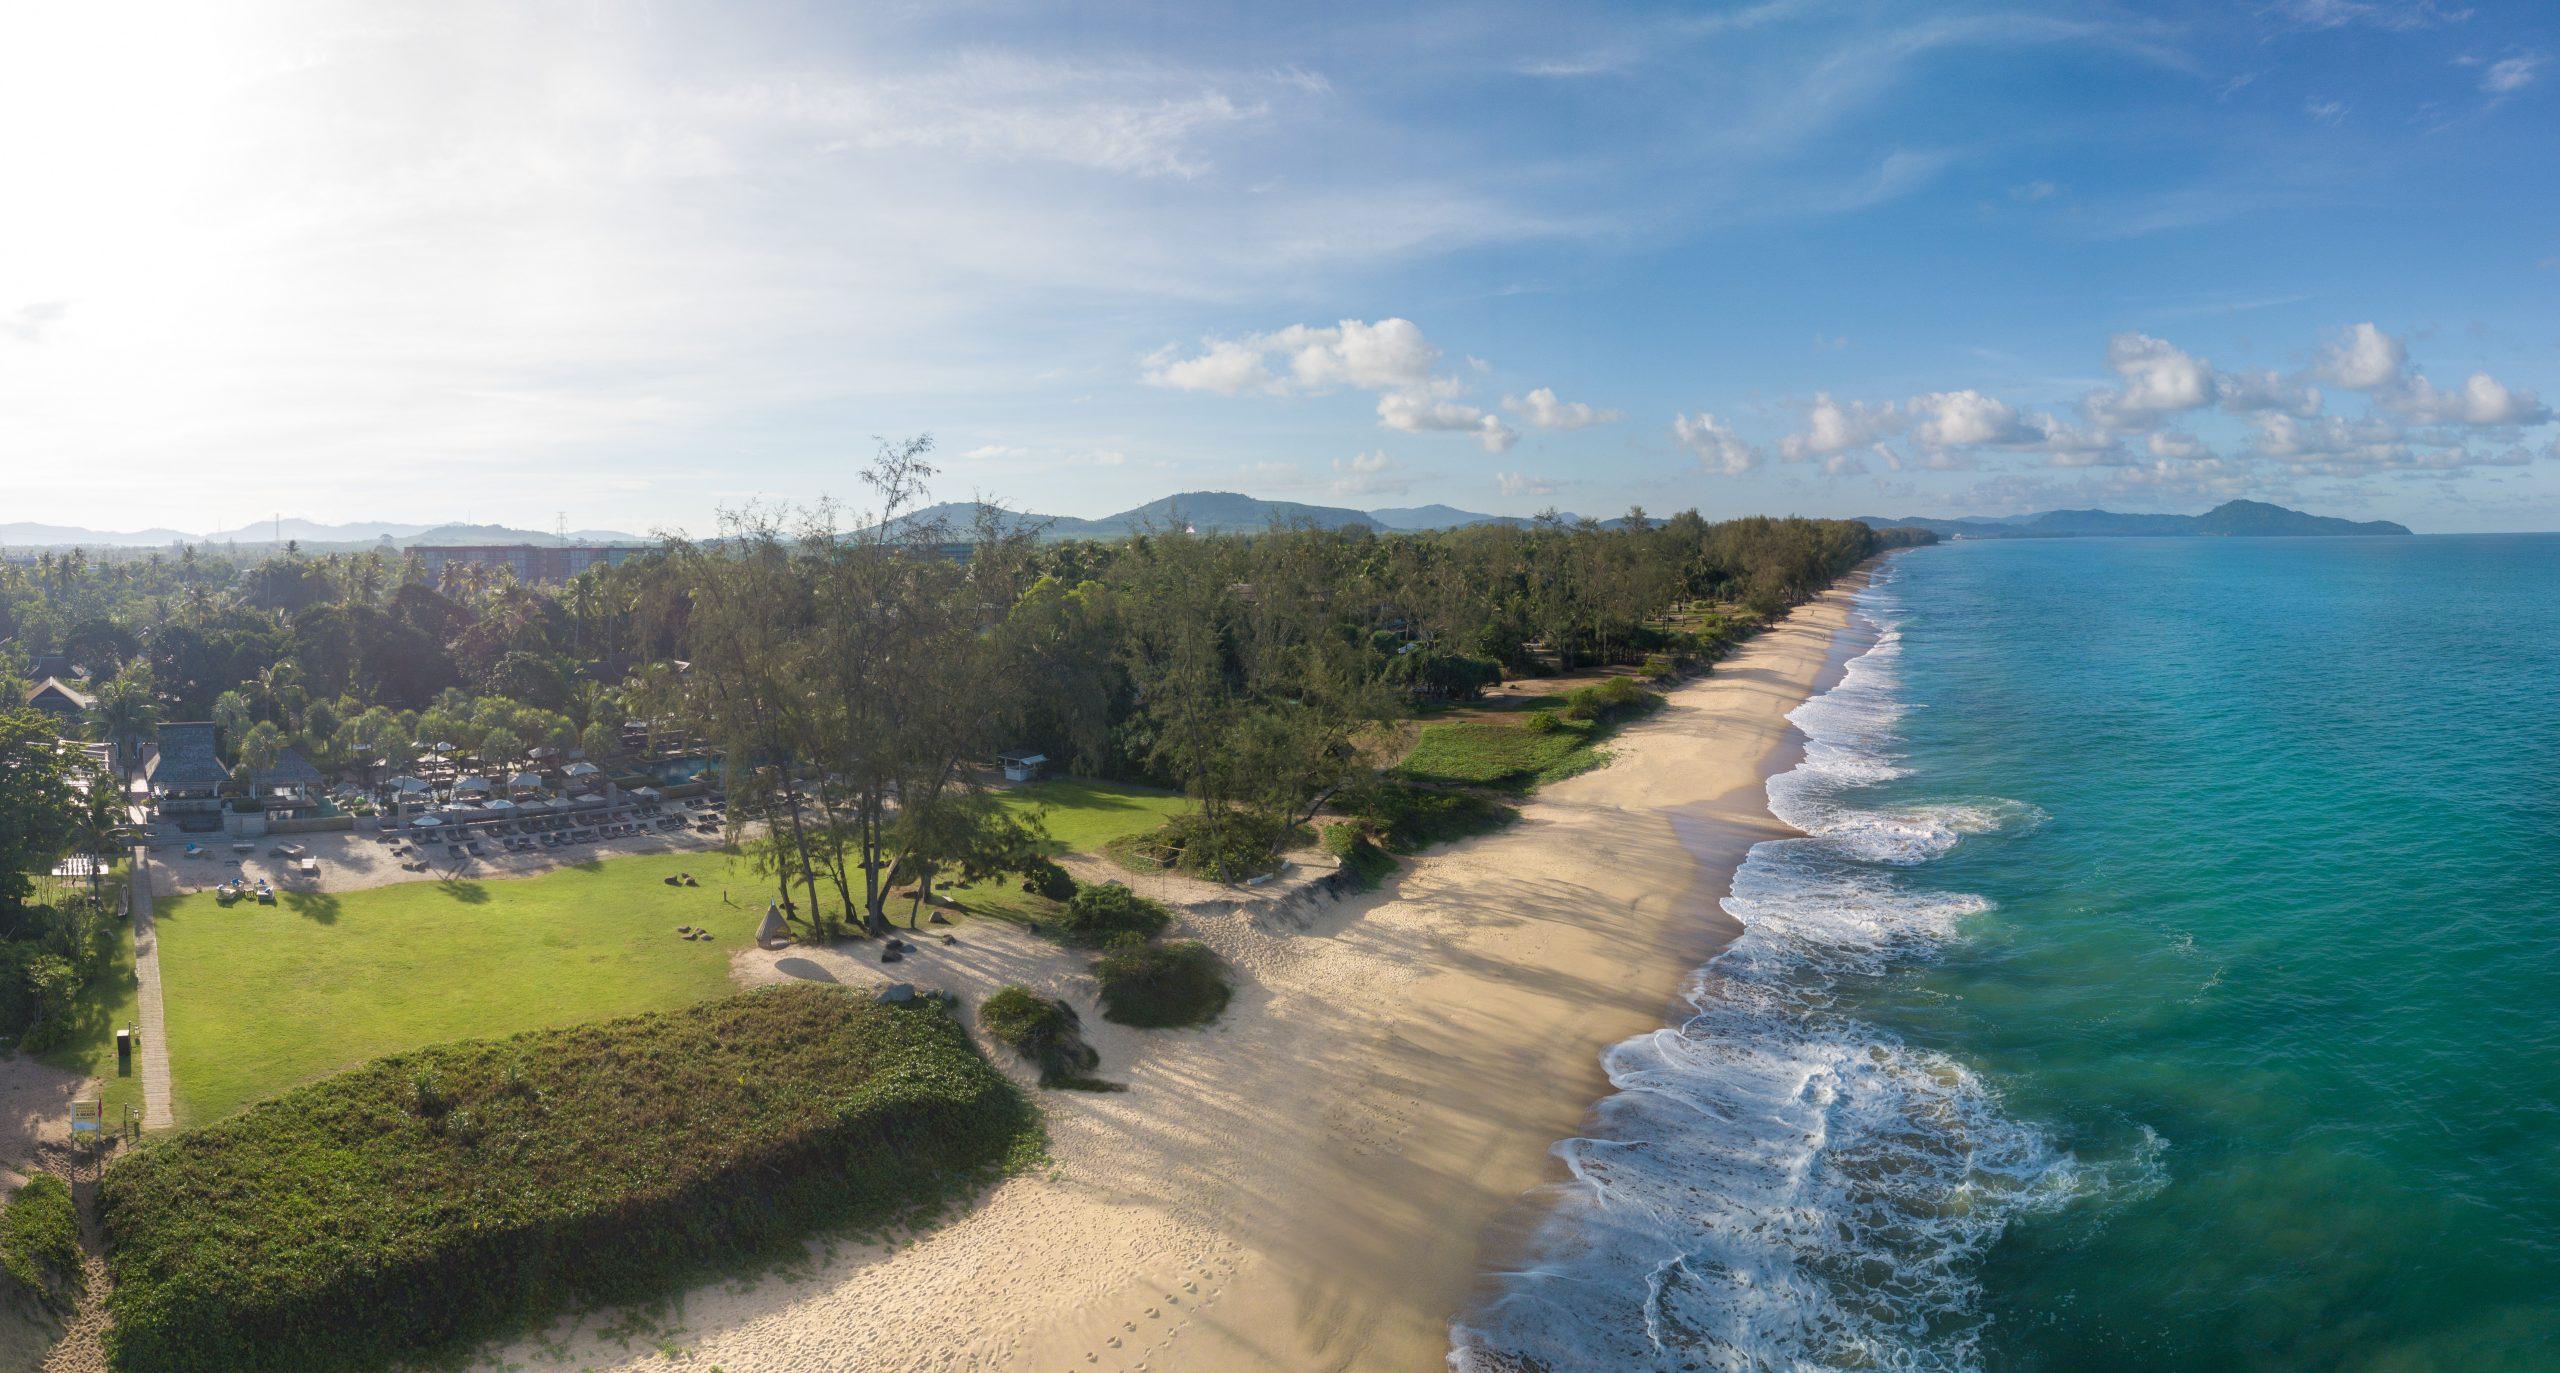 Anantara Mai Khao Beach